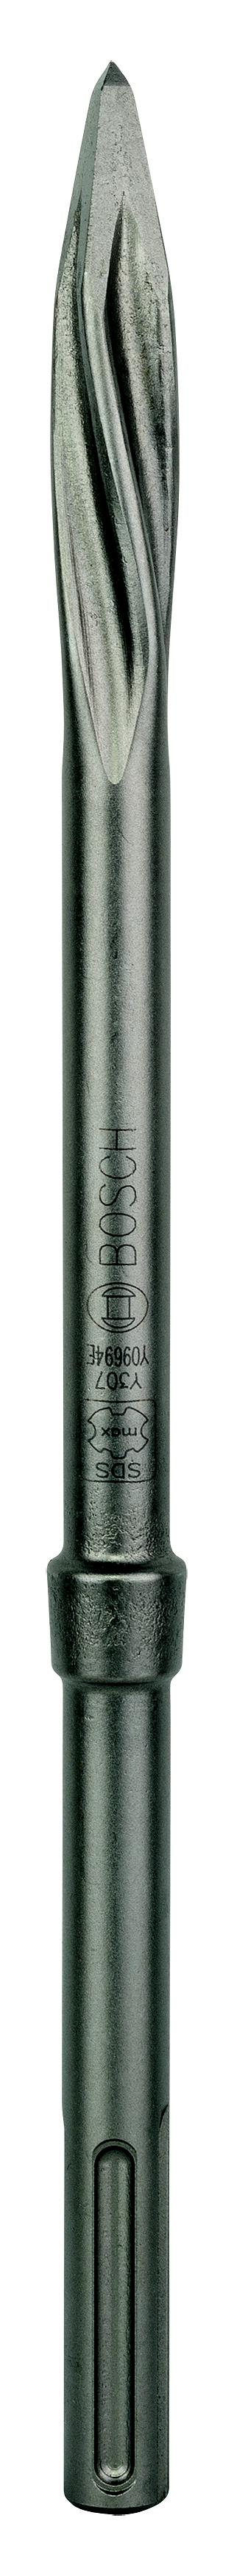 Пика Bosch Sdsmax rtec 400 мм (2.608.690.167) пика практика 035 202 sdsmax 400мм